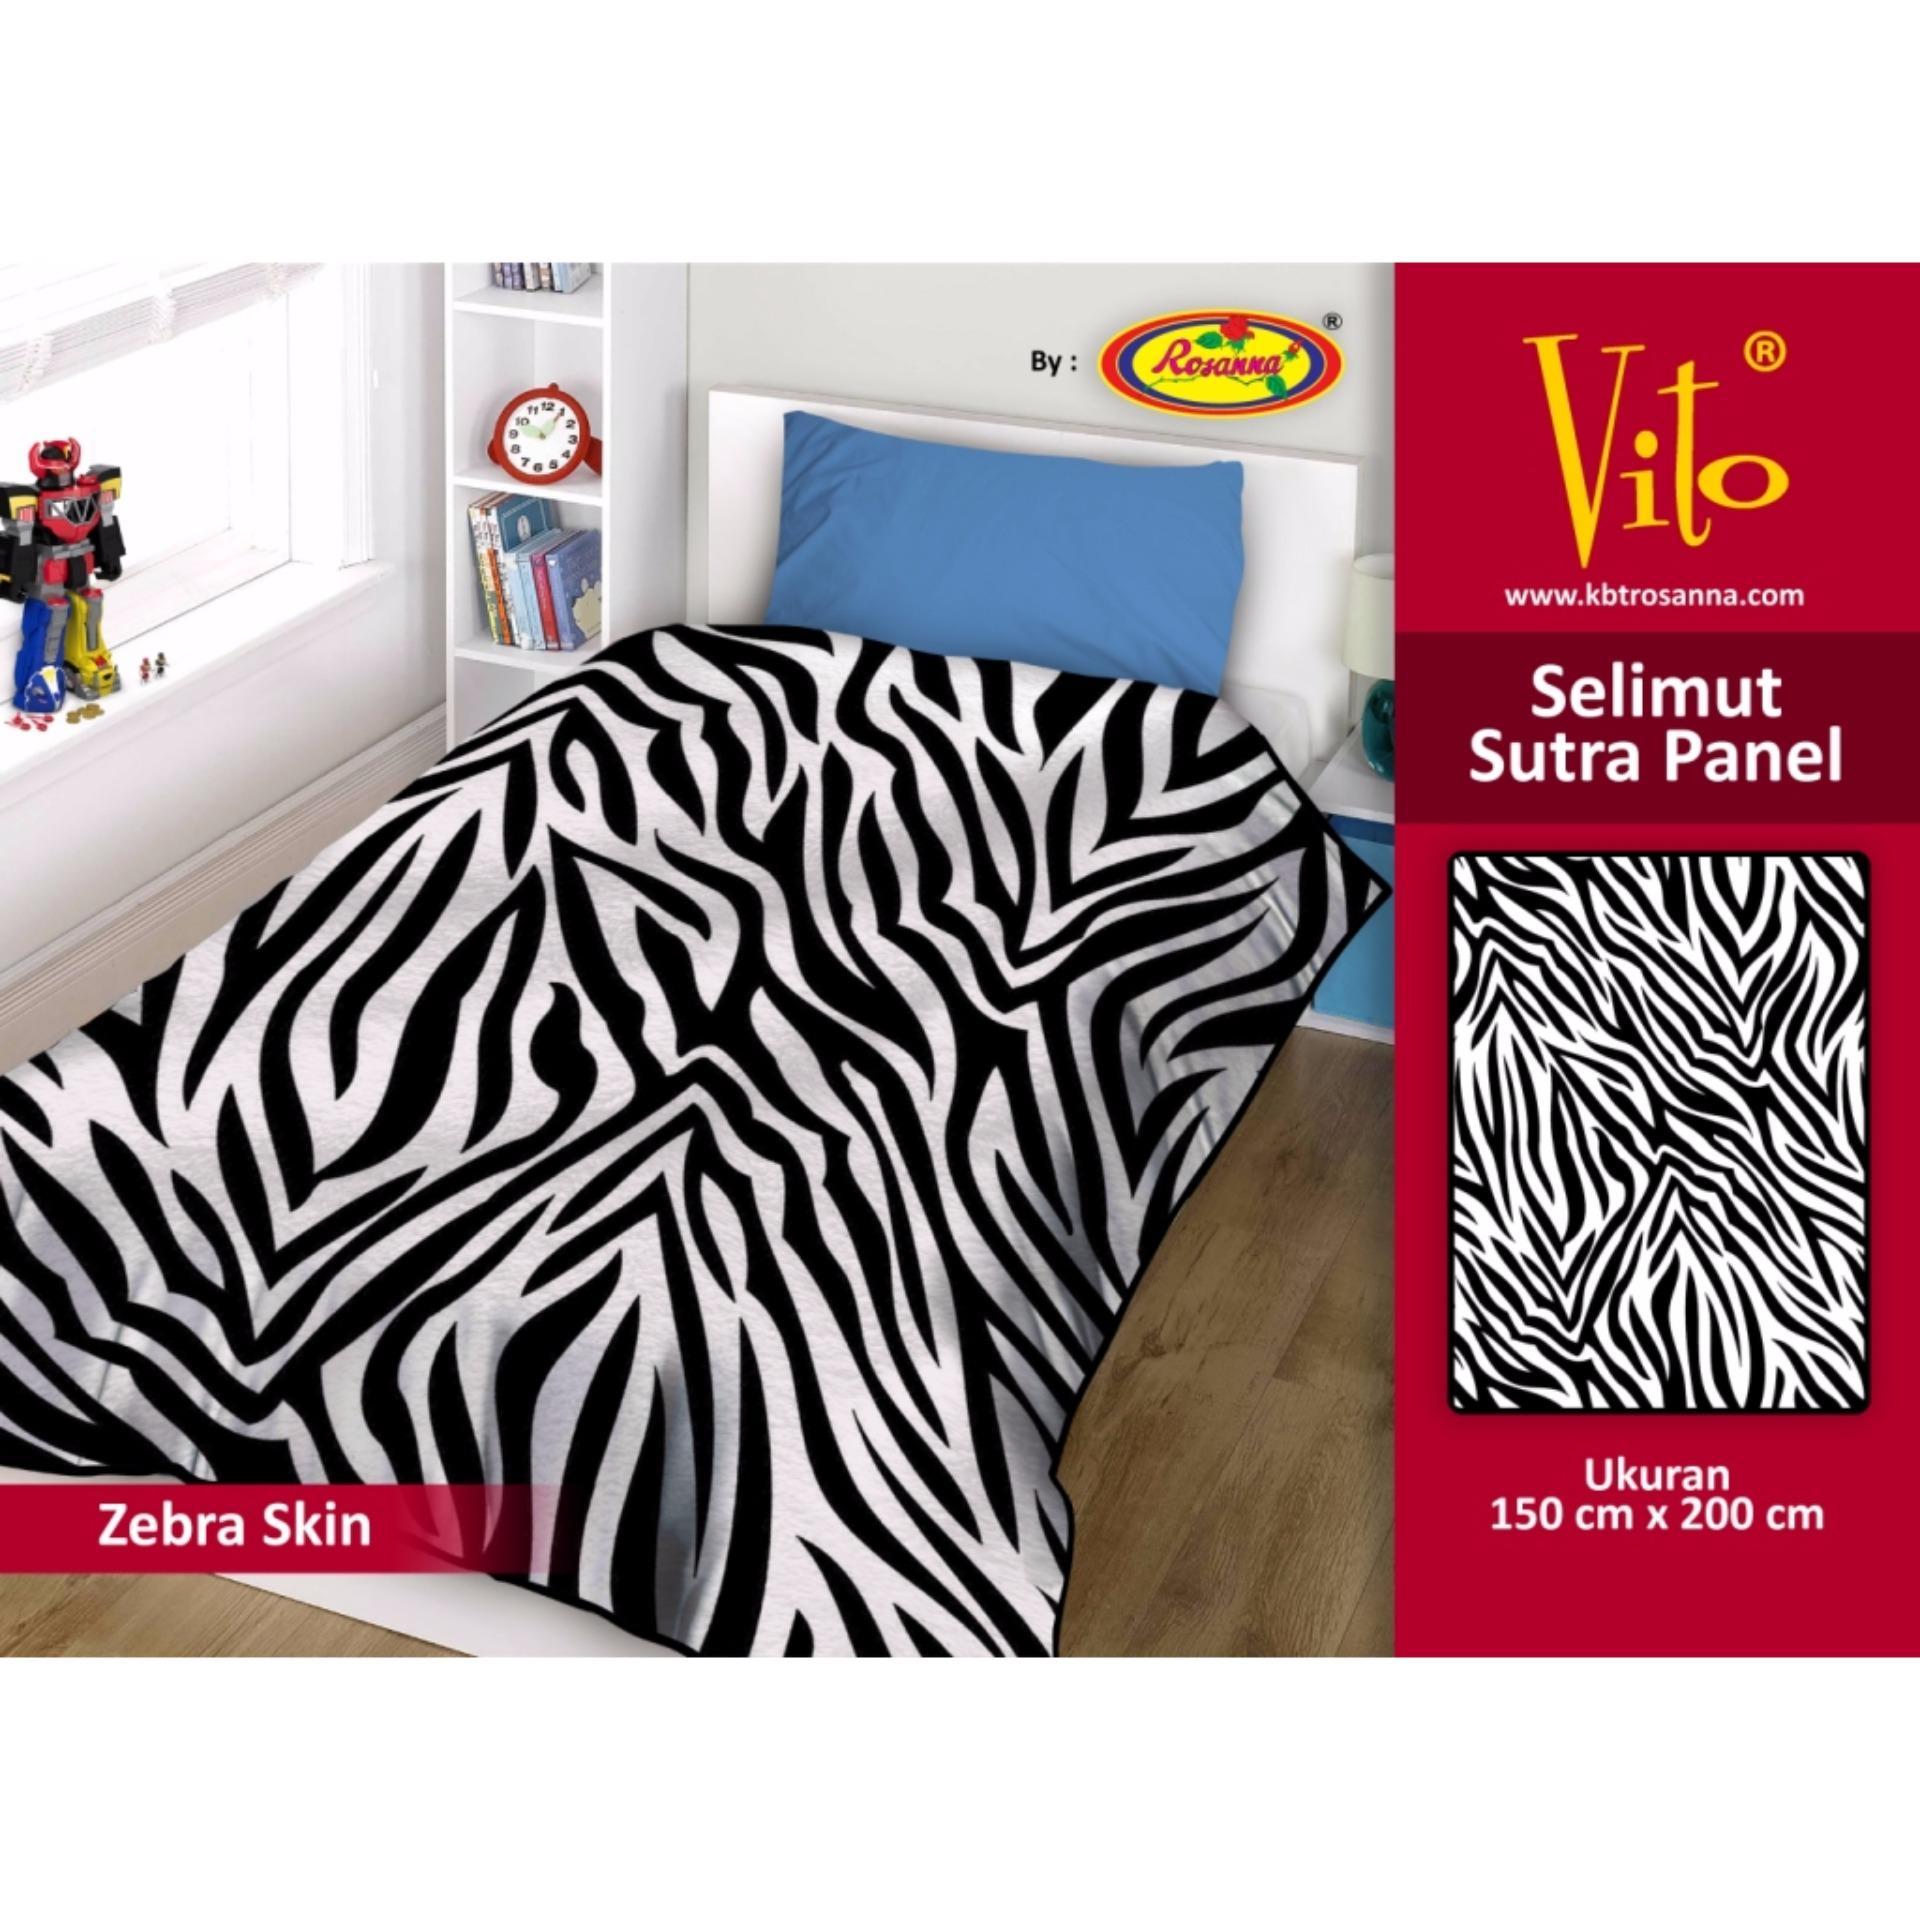 Tips Beli Selimut Vito Sutra Panel 150X200 Zebra Skin Yang Bagus